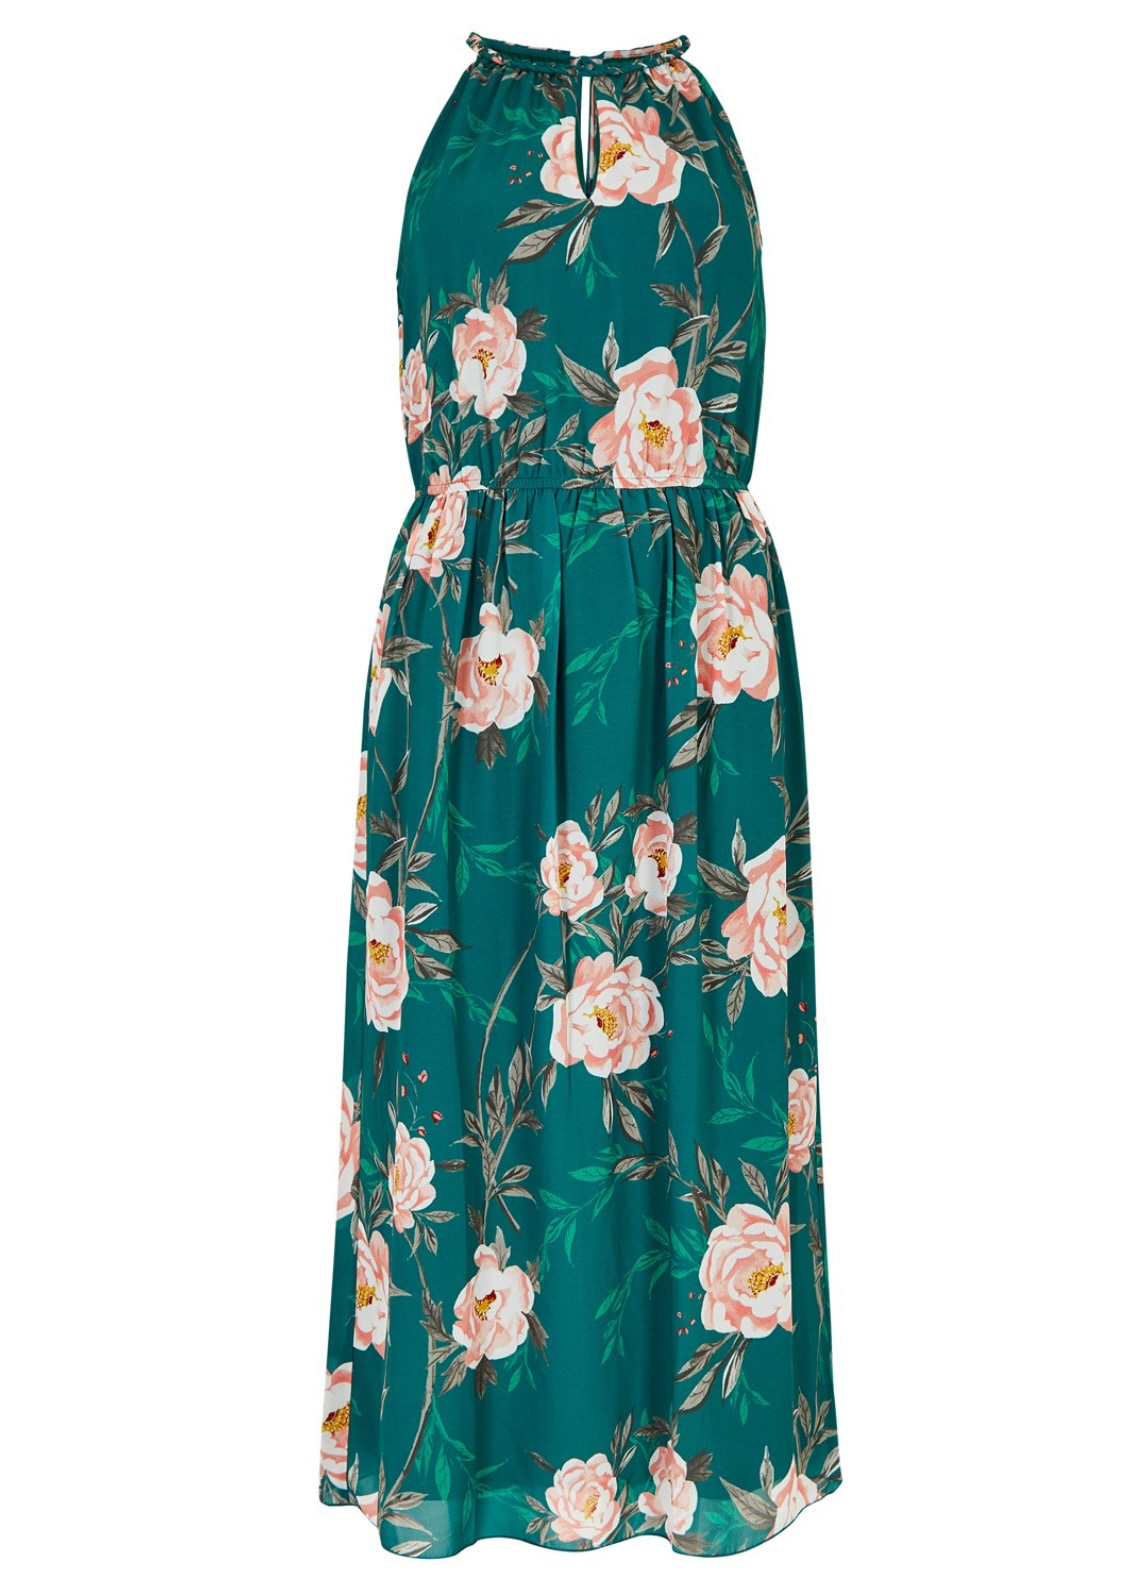 Image of Apricot Chiffonkleid »Peony Print Rope Neck Midi Dress«